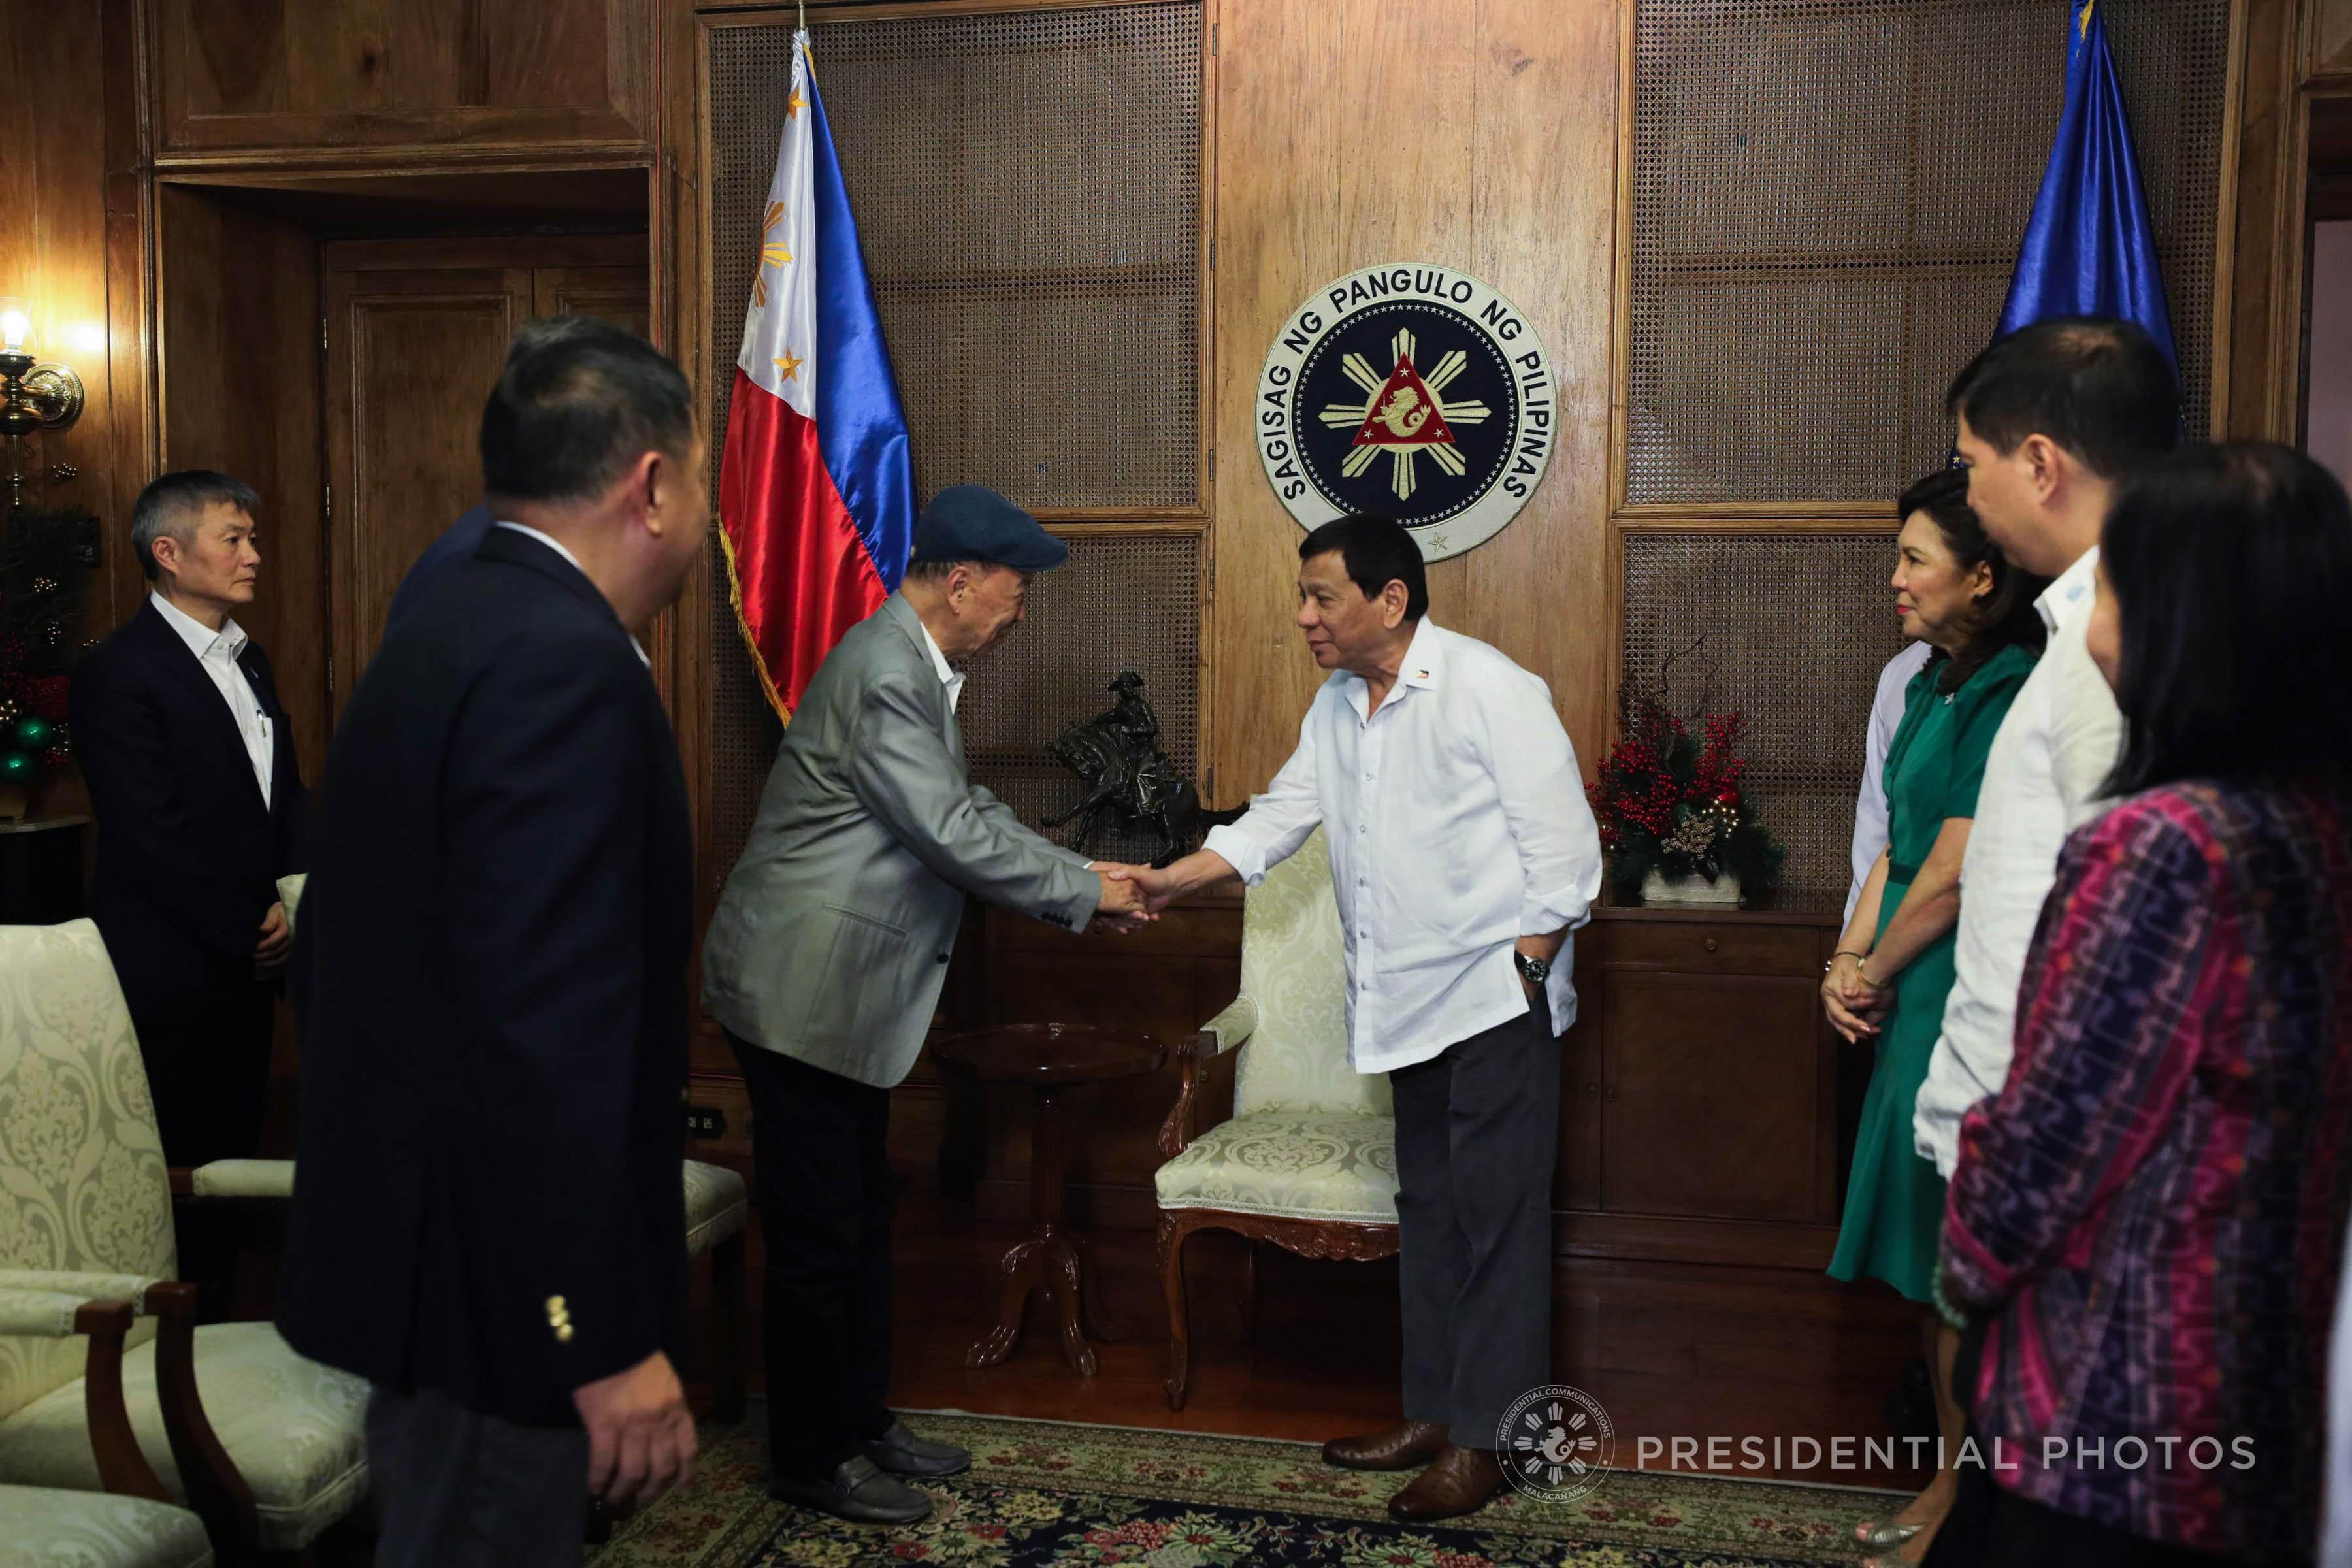 MEETING IN PALACE. President Rodrigo Duterte greets Galaxy Entertainment Group Limited Chairman Dr Lui Che Woo who in Malacau00f1ang Palace onu00a0December 6, 2017. Malacau00f1ang file photo